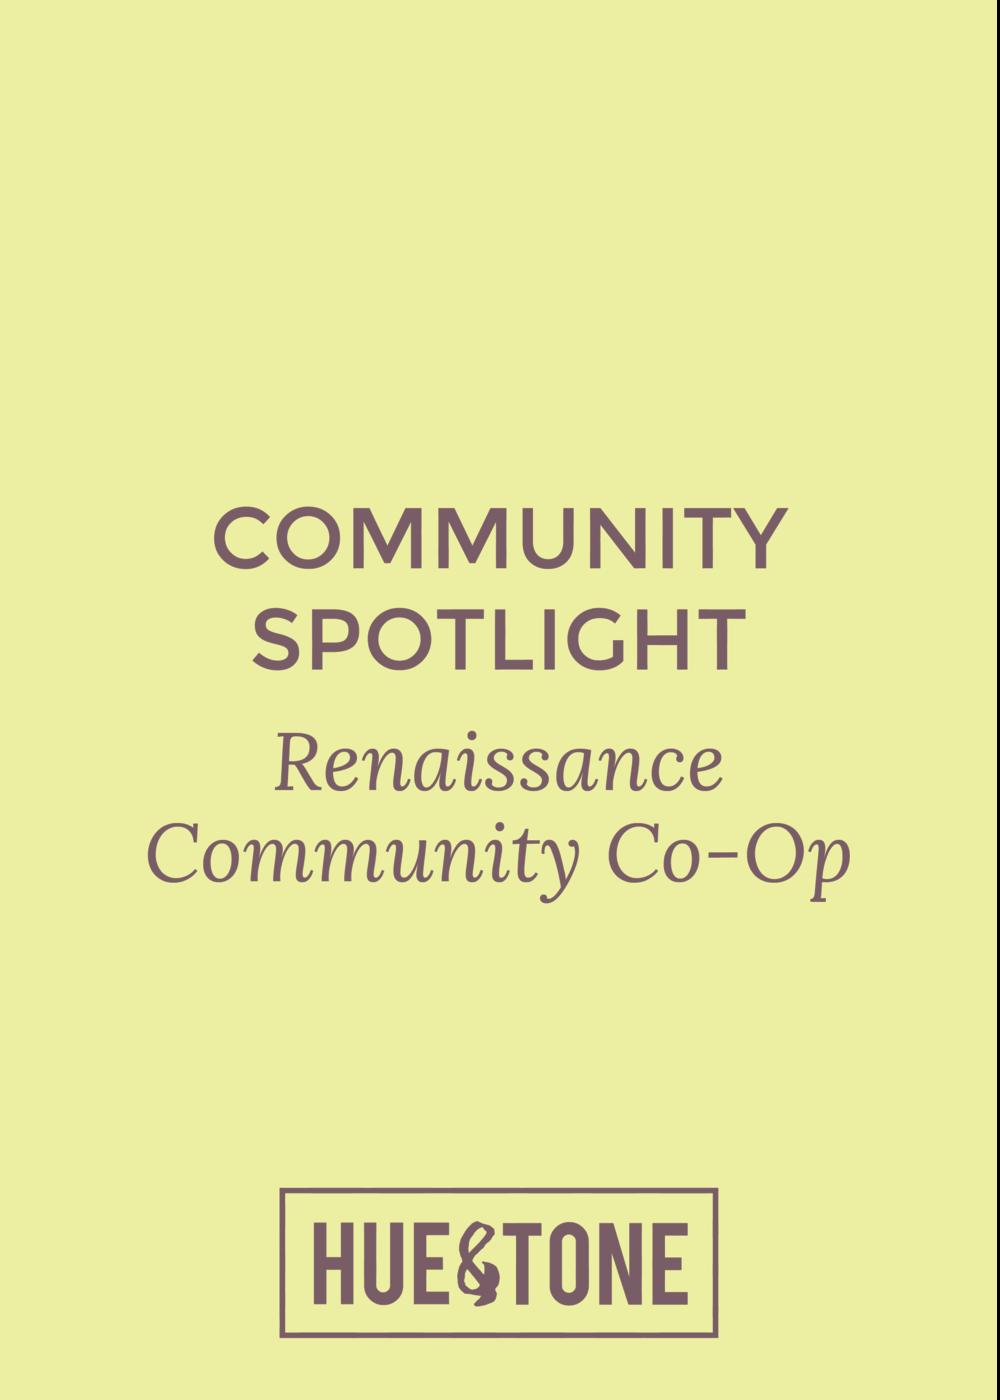 Renaissance Community Co-Op -- Hue & Tone Creative